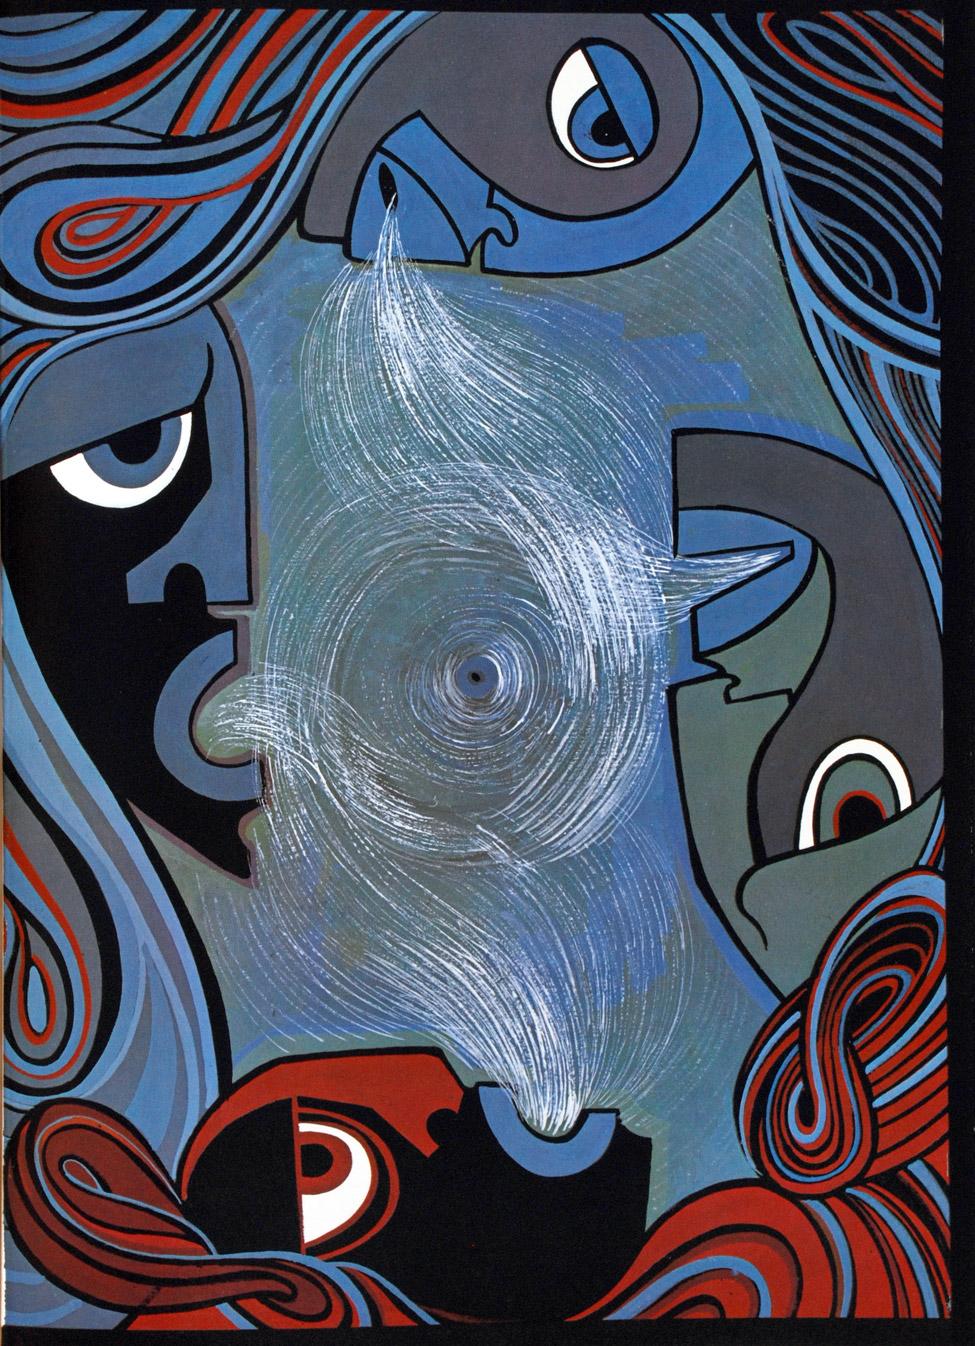 Pauline Kahurangi Yearbury. <i>The Children of Rangi and Papa: The Maori Story of Creation</i>. Christchurch: Whitcoulls Publishers, 1976.